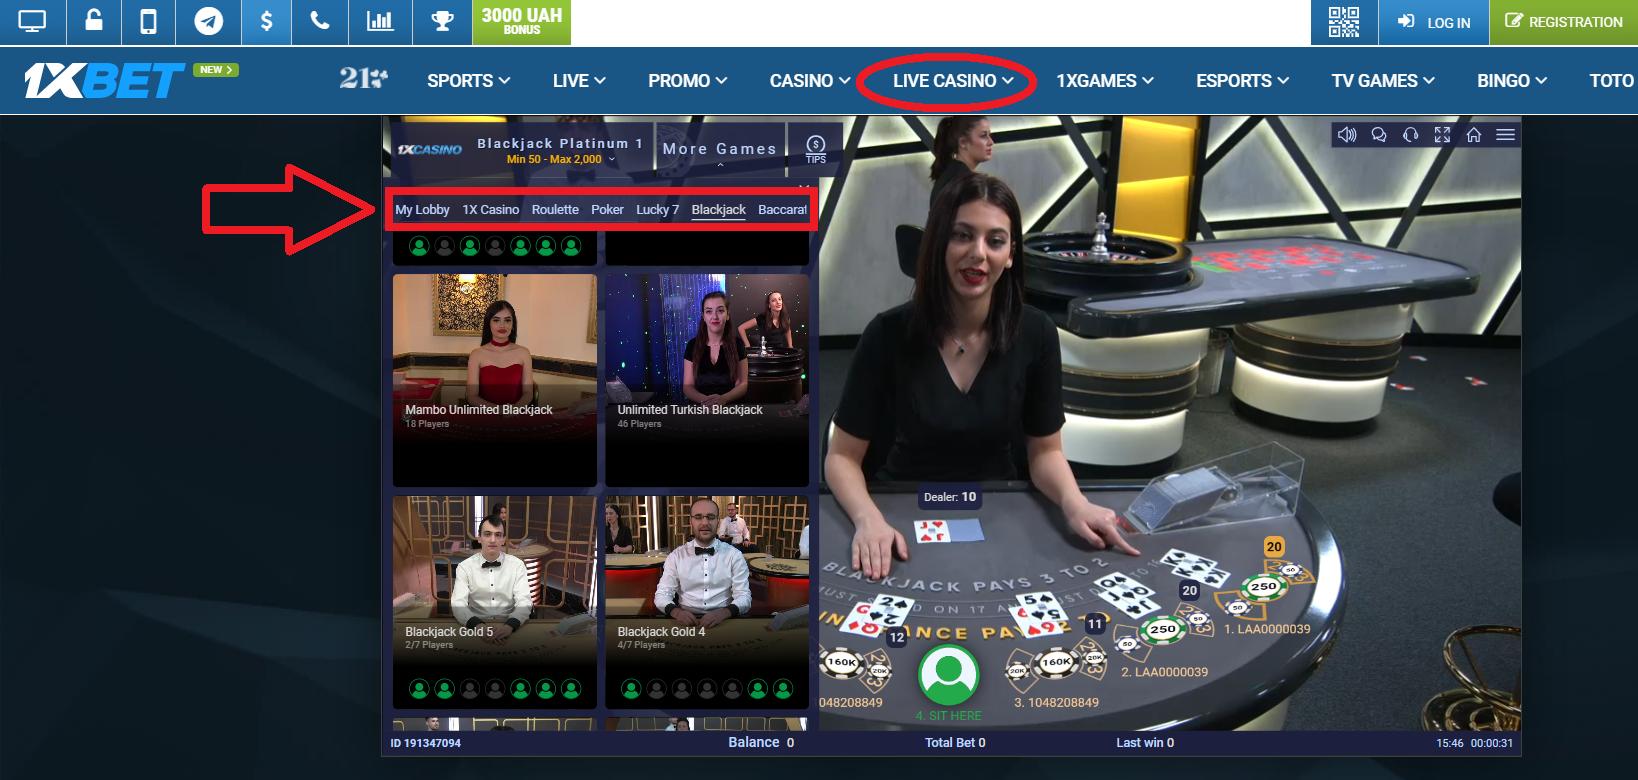 Betting with 1xBet Kenya